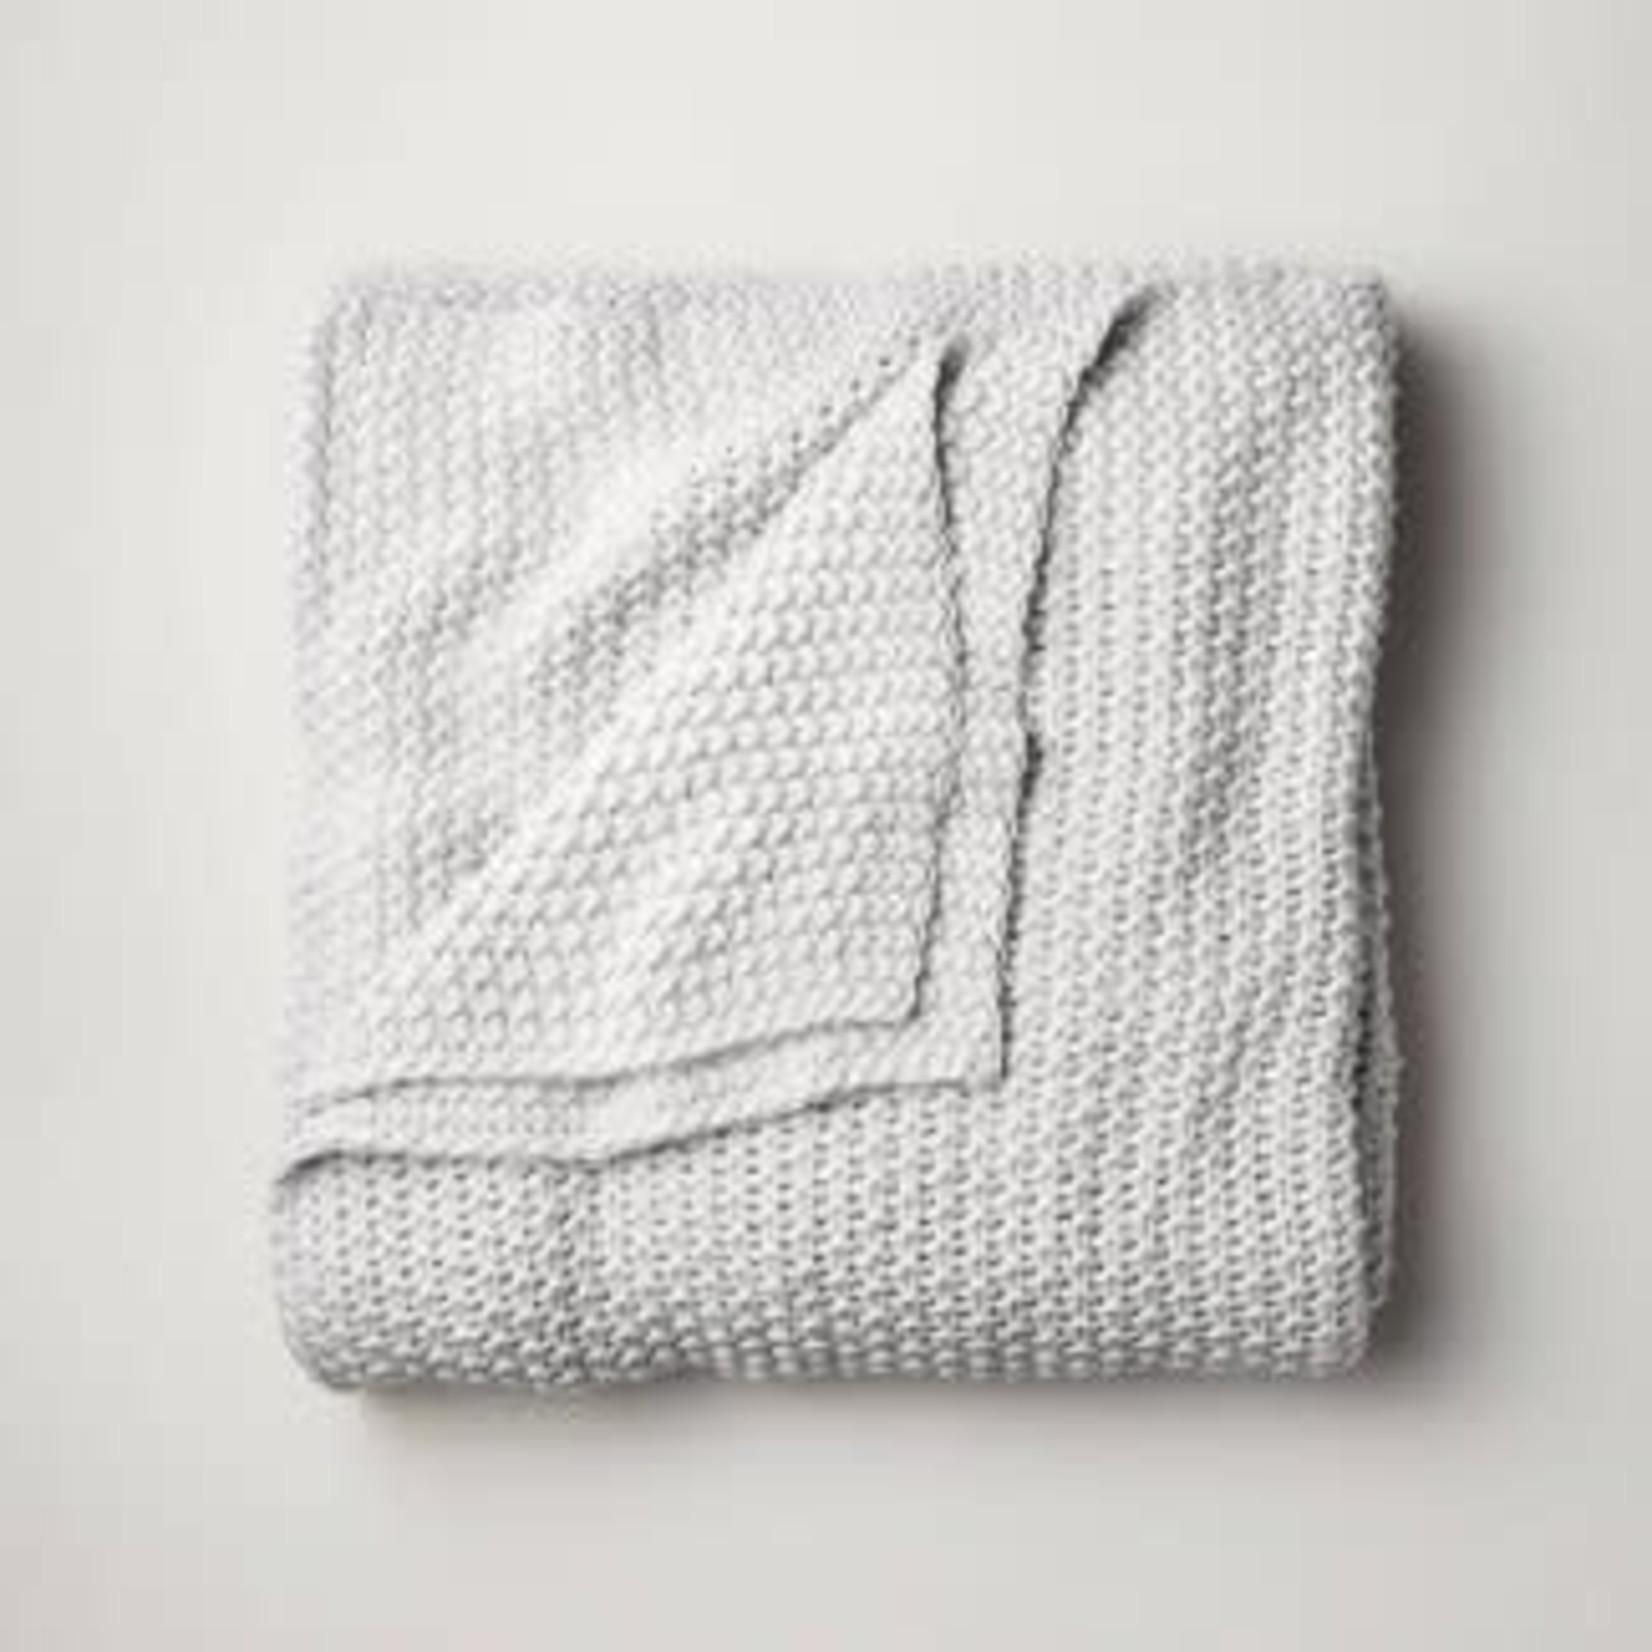 Casaluna Chunky Knit Bed Blanket-KING Grey